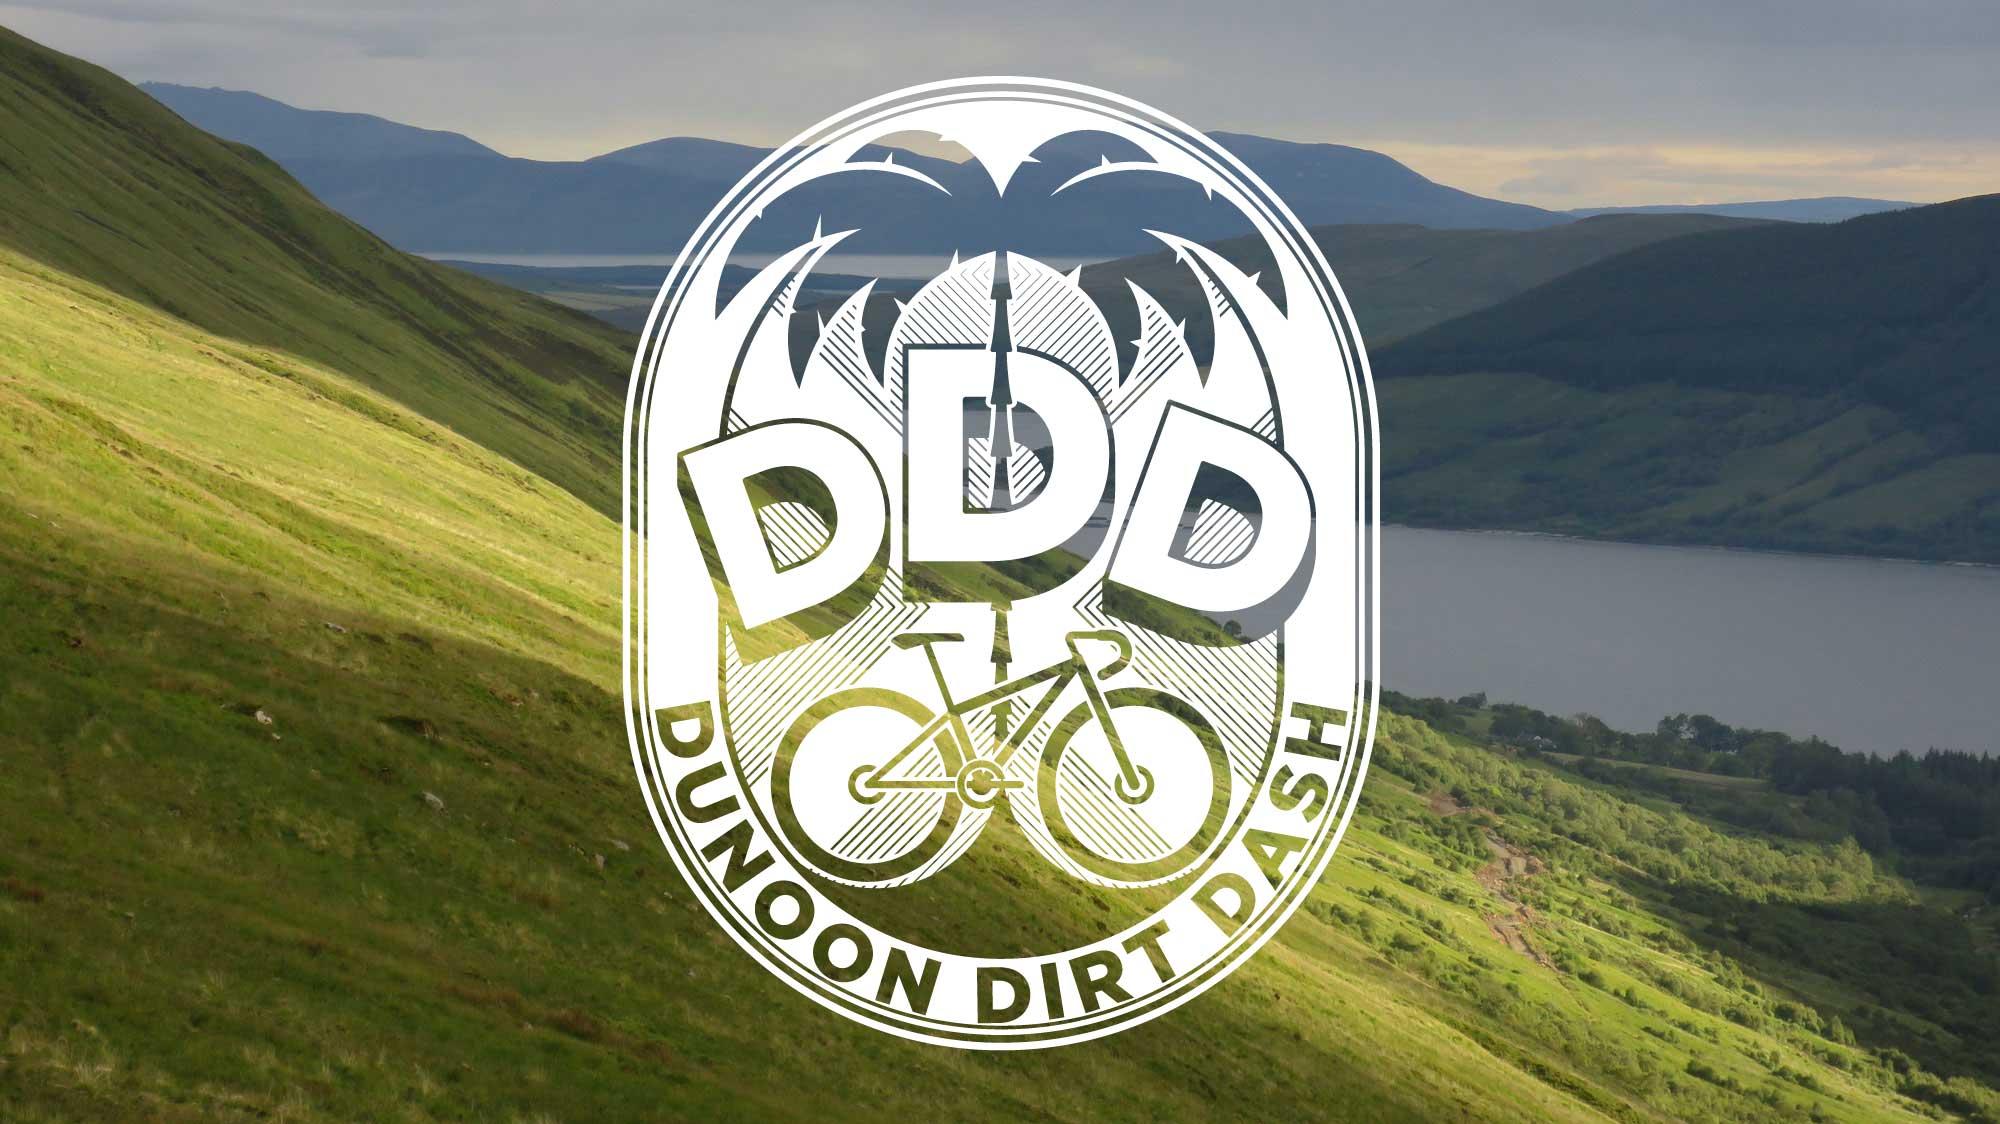 Dunoon Dirt Dash